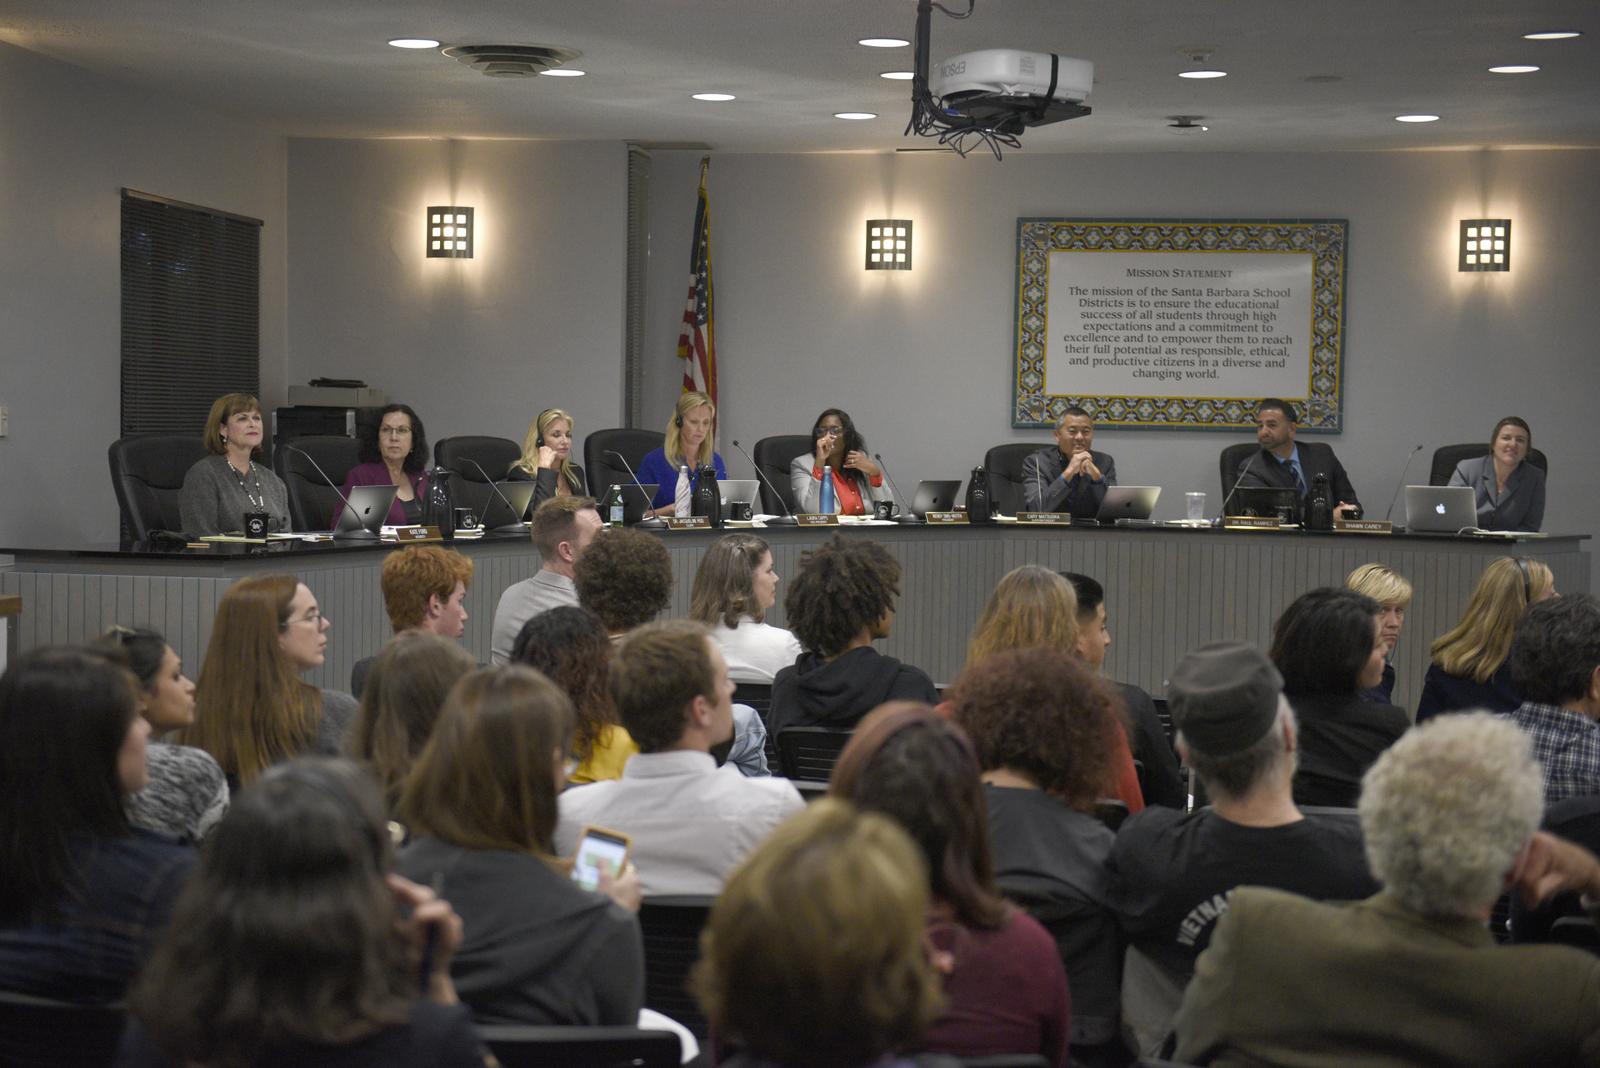 Fair Education vs  Just Communities Boils Over at School